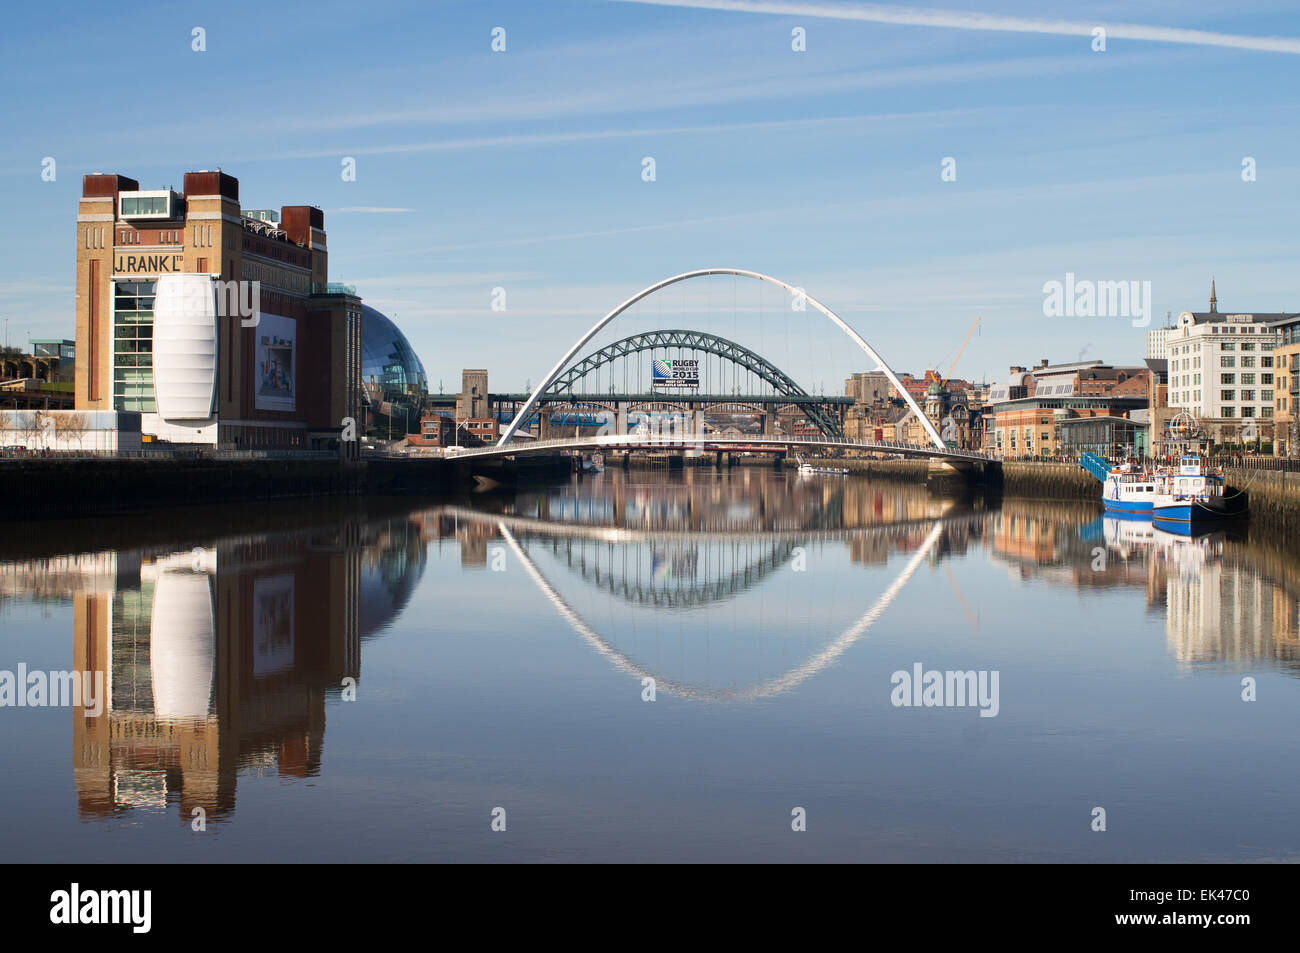 tyne-bridges-and-baltic-gallery-reflecte